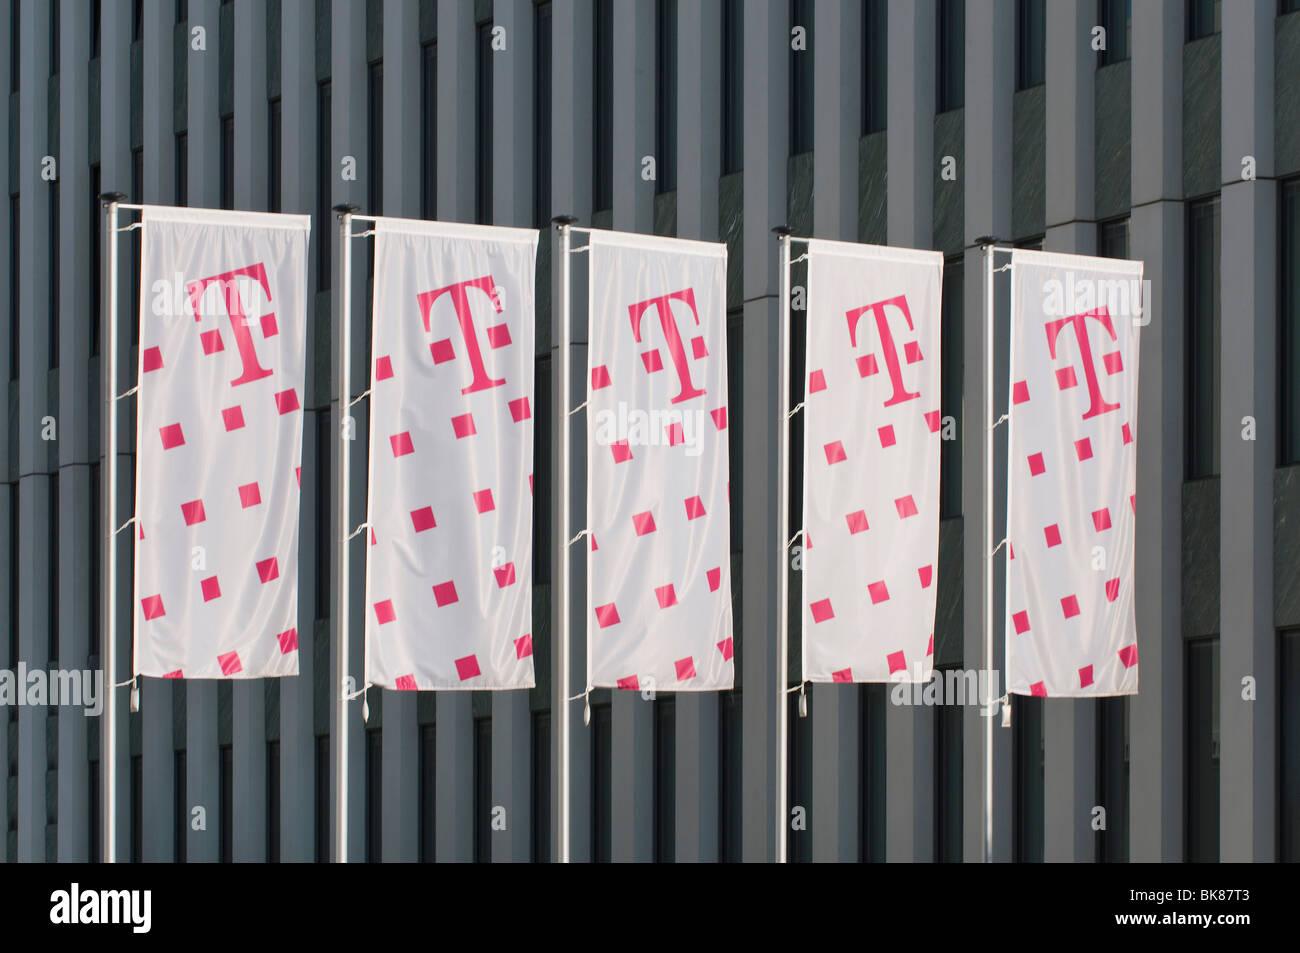 Five Telekom flags in front of an office building facade, Deutsche Telekom AG, Bonn, North Rhine-Westphalia, Germany, - Stock Image